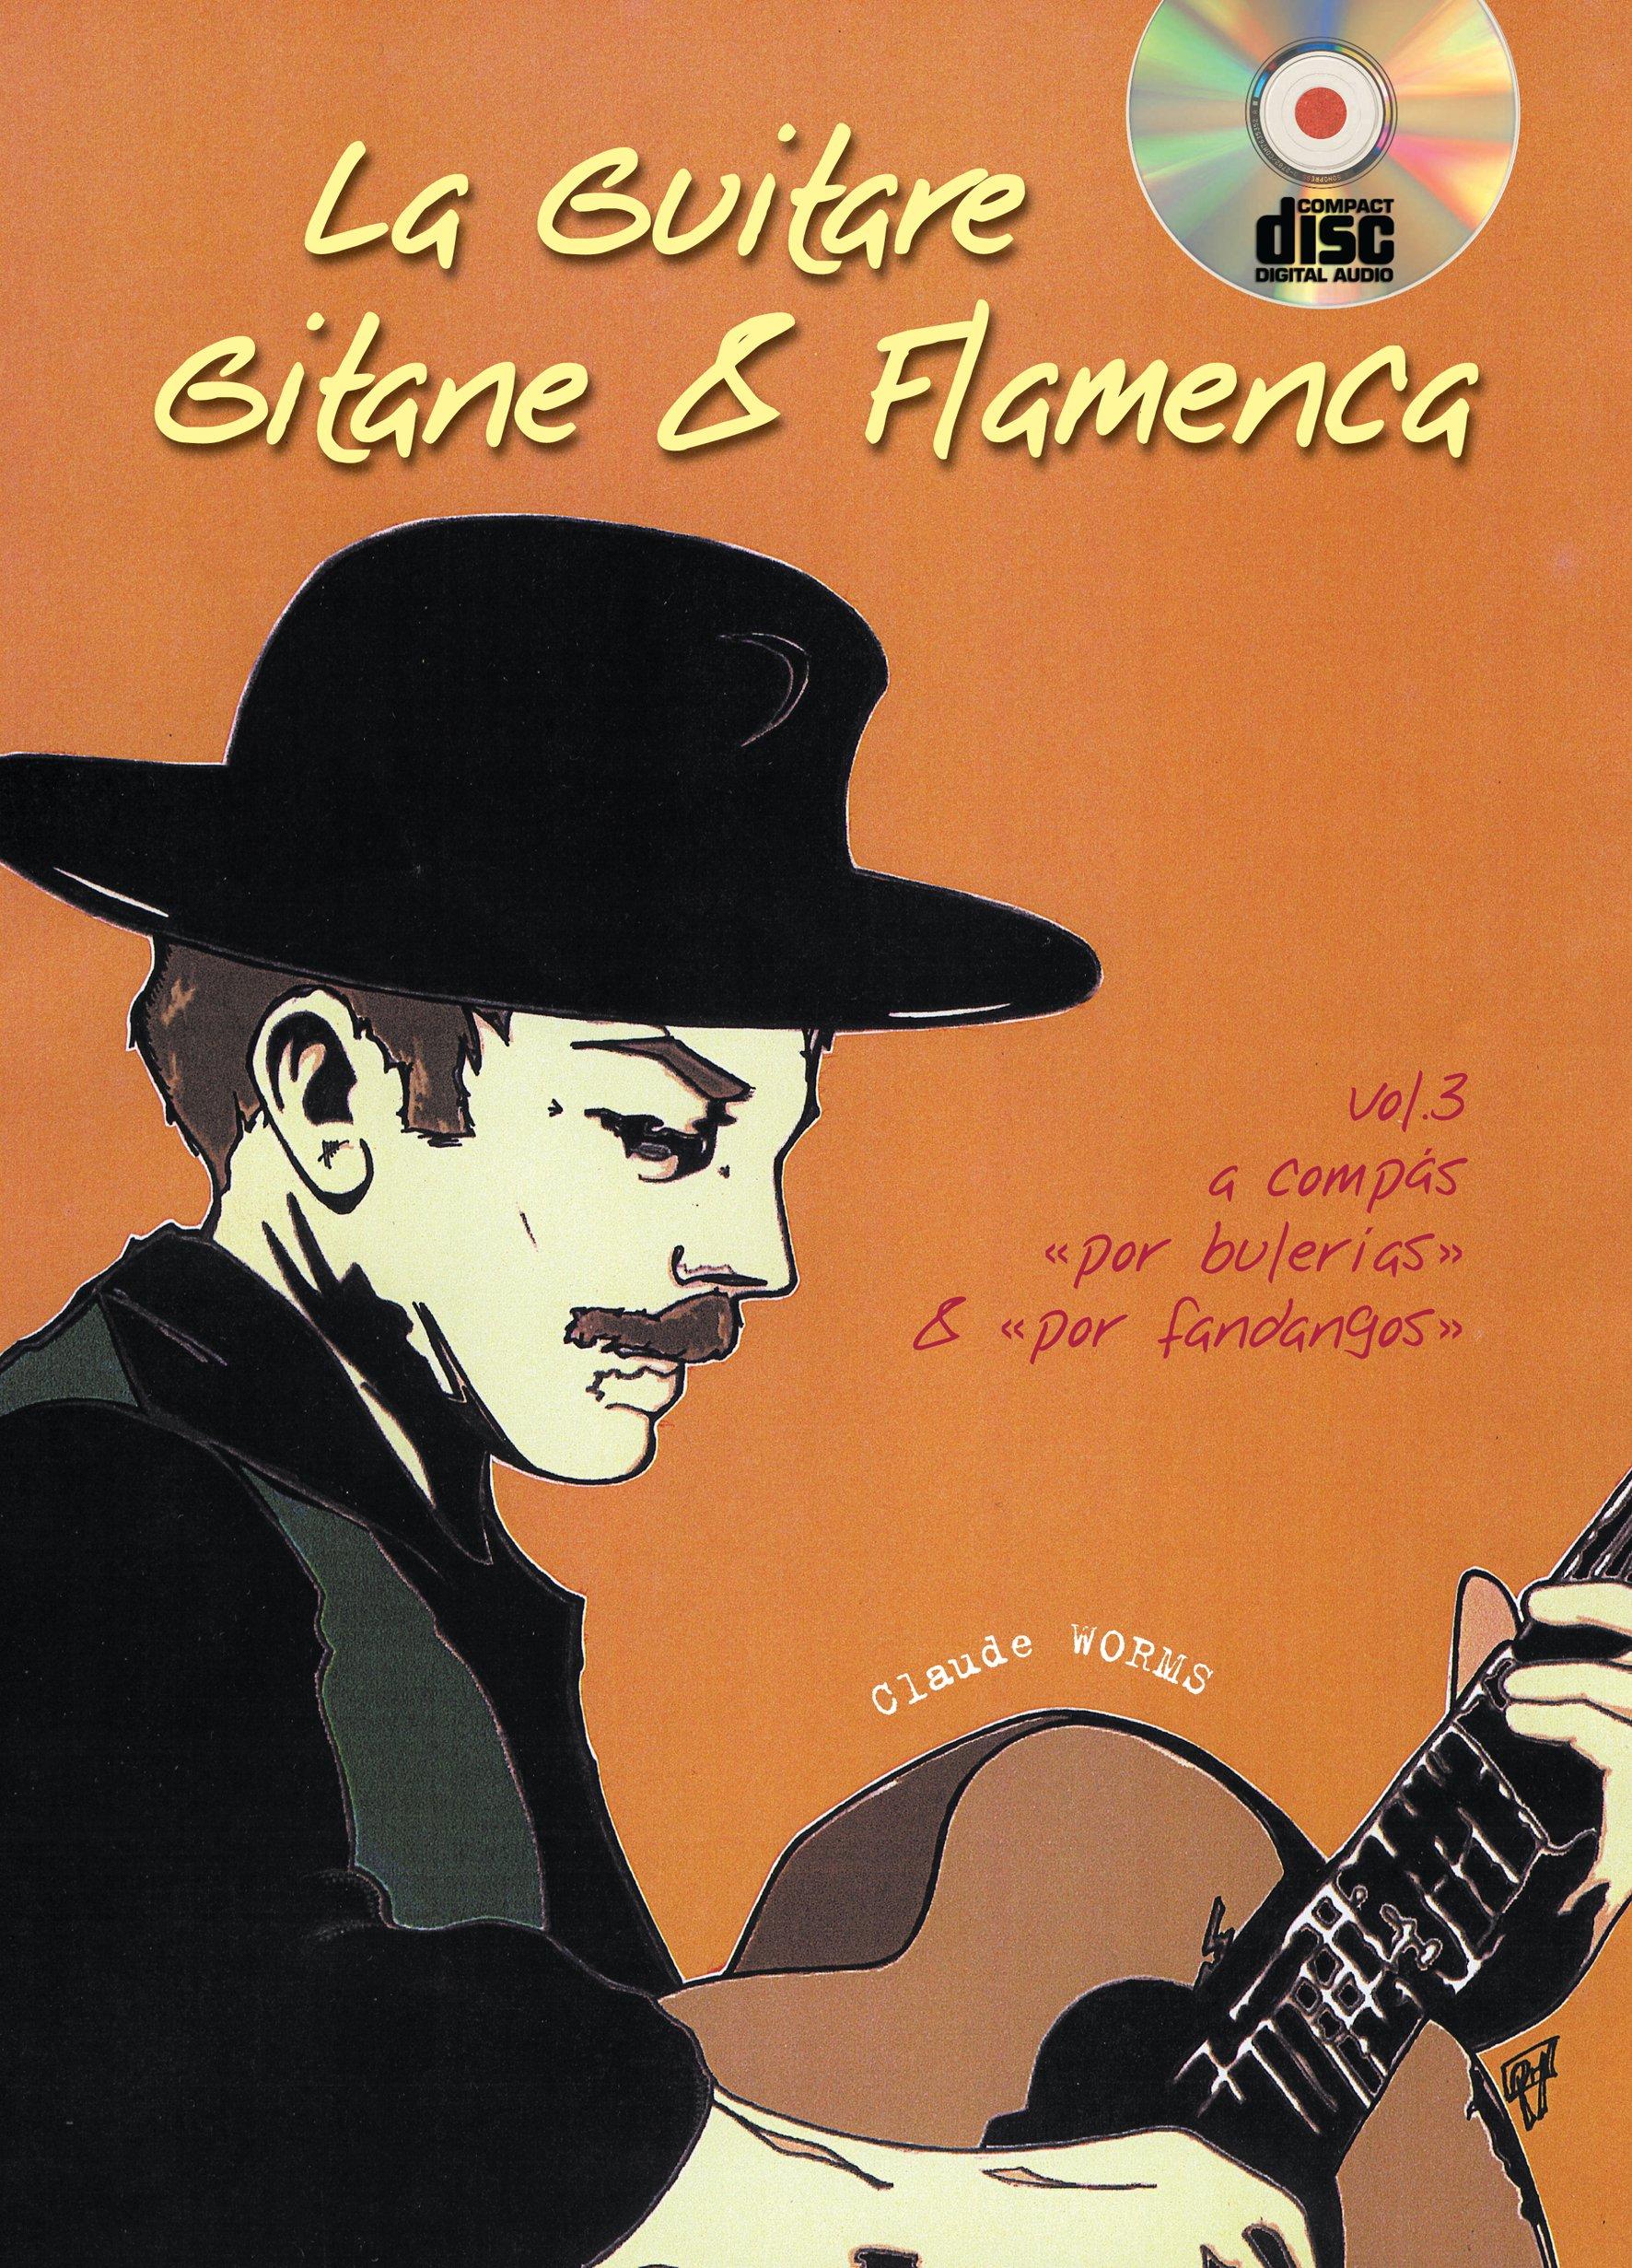 Volume 1 Learn to Play MUSIC BOOK /& CD Guitar Tab Guitare Gitane /& Flamenca La